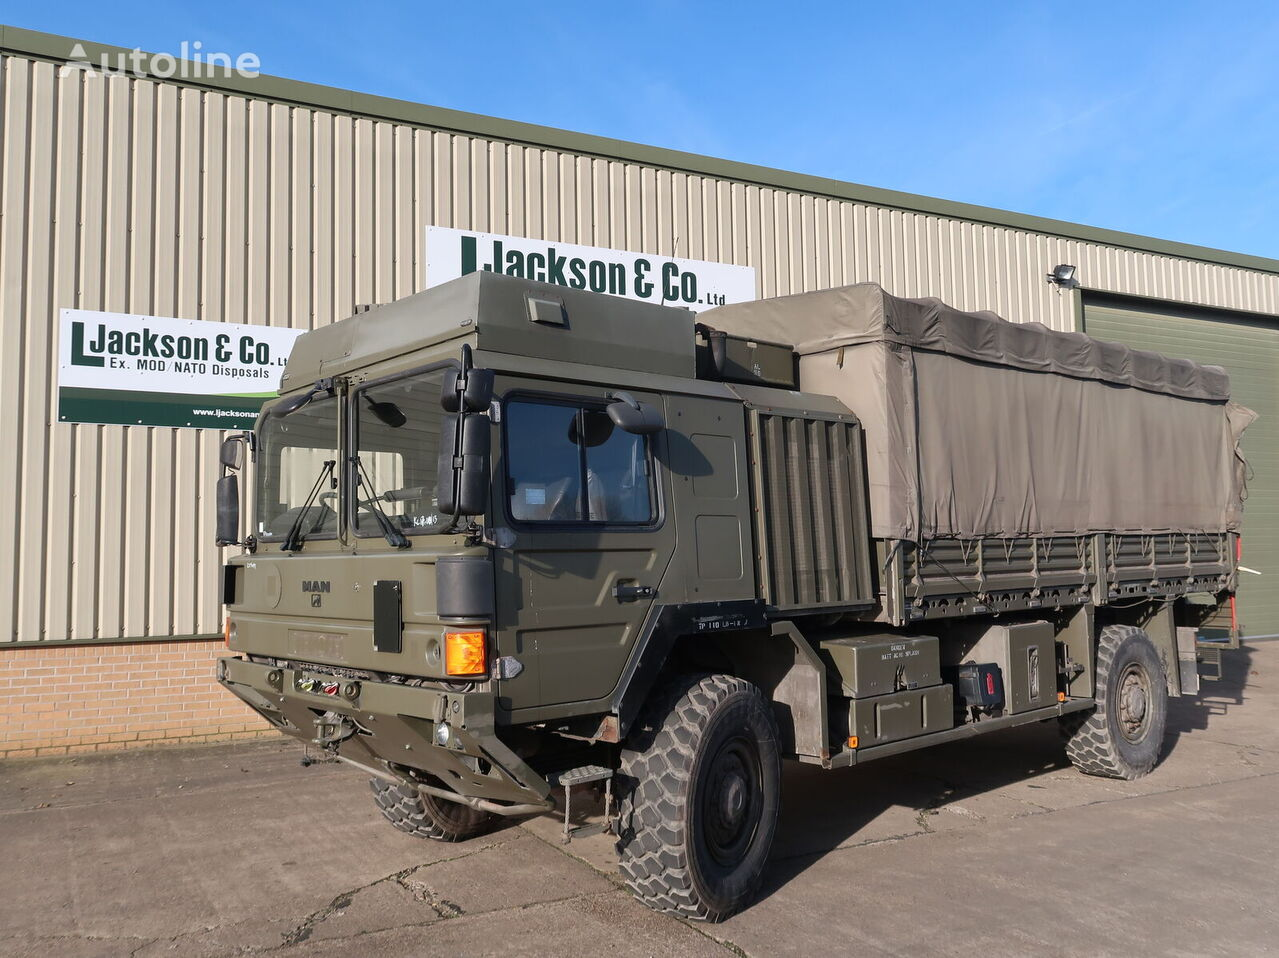 camion militar MAN HX60 18.330 4x4 Army Truck